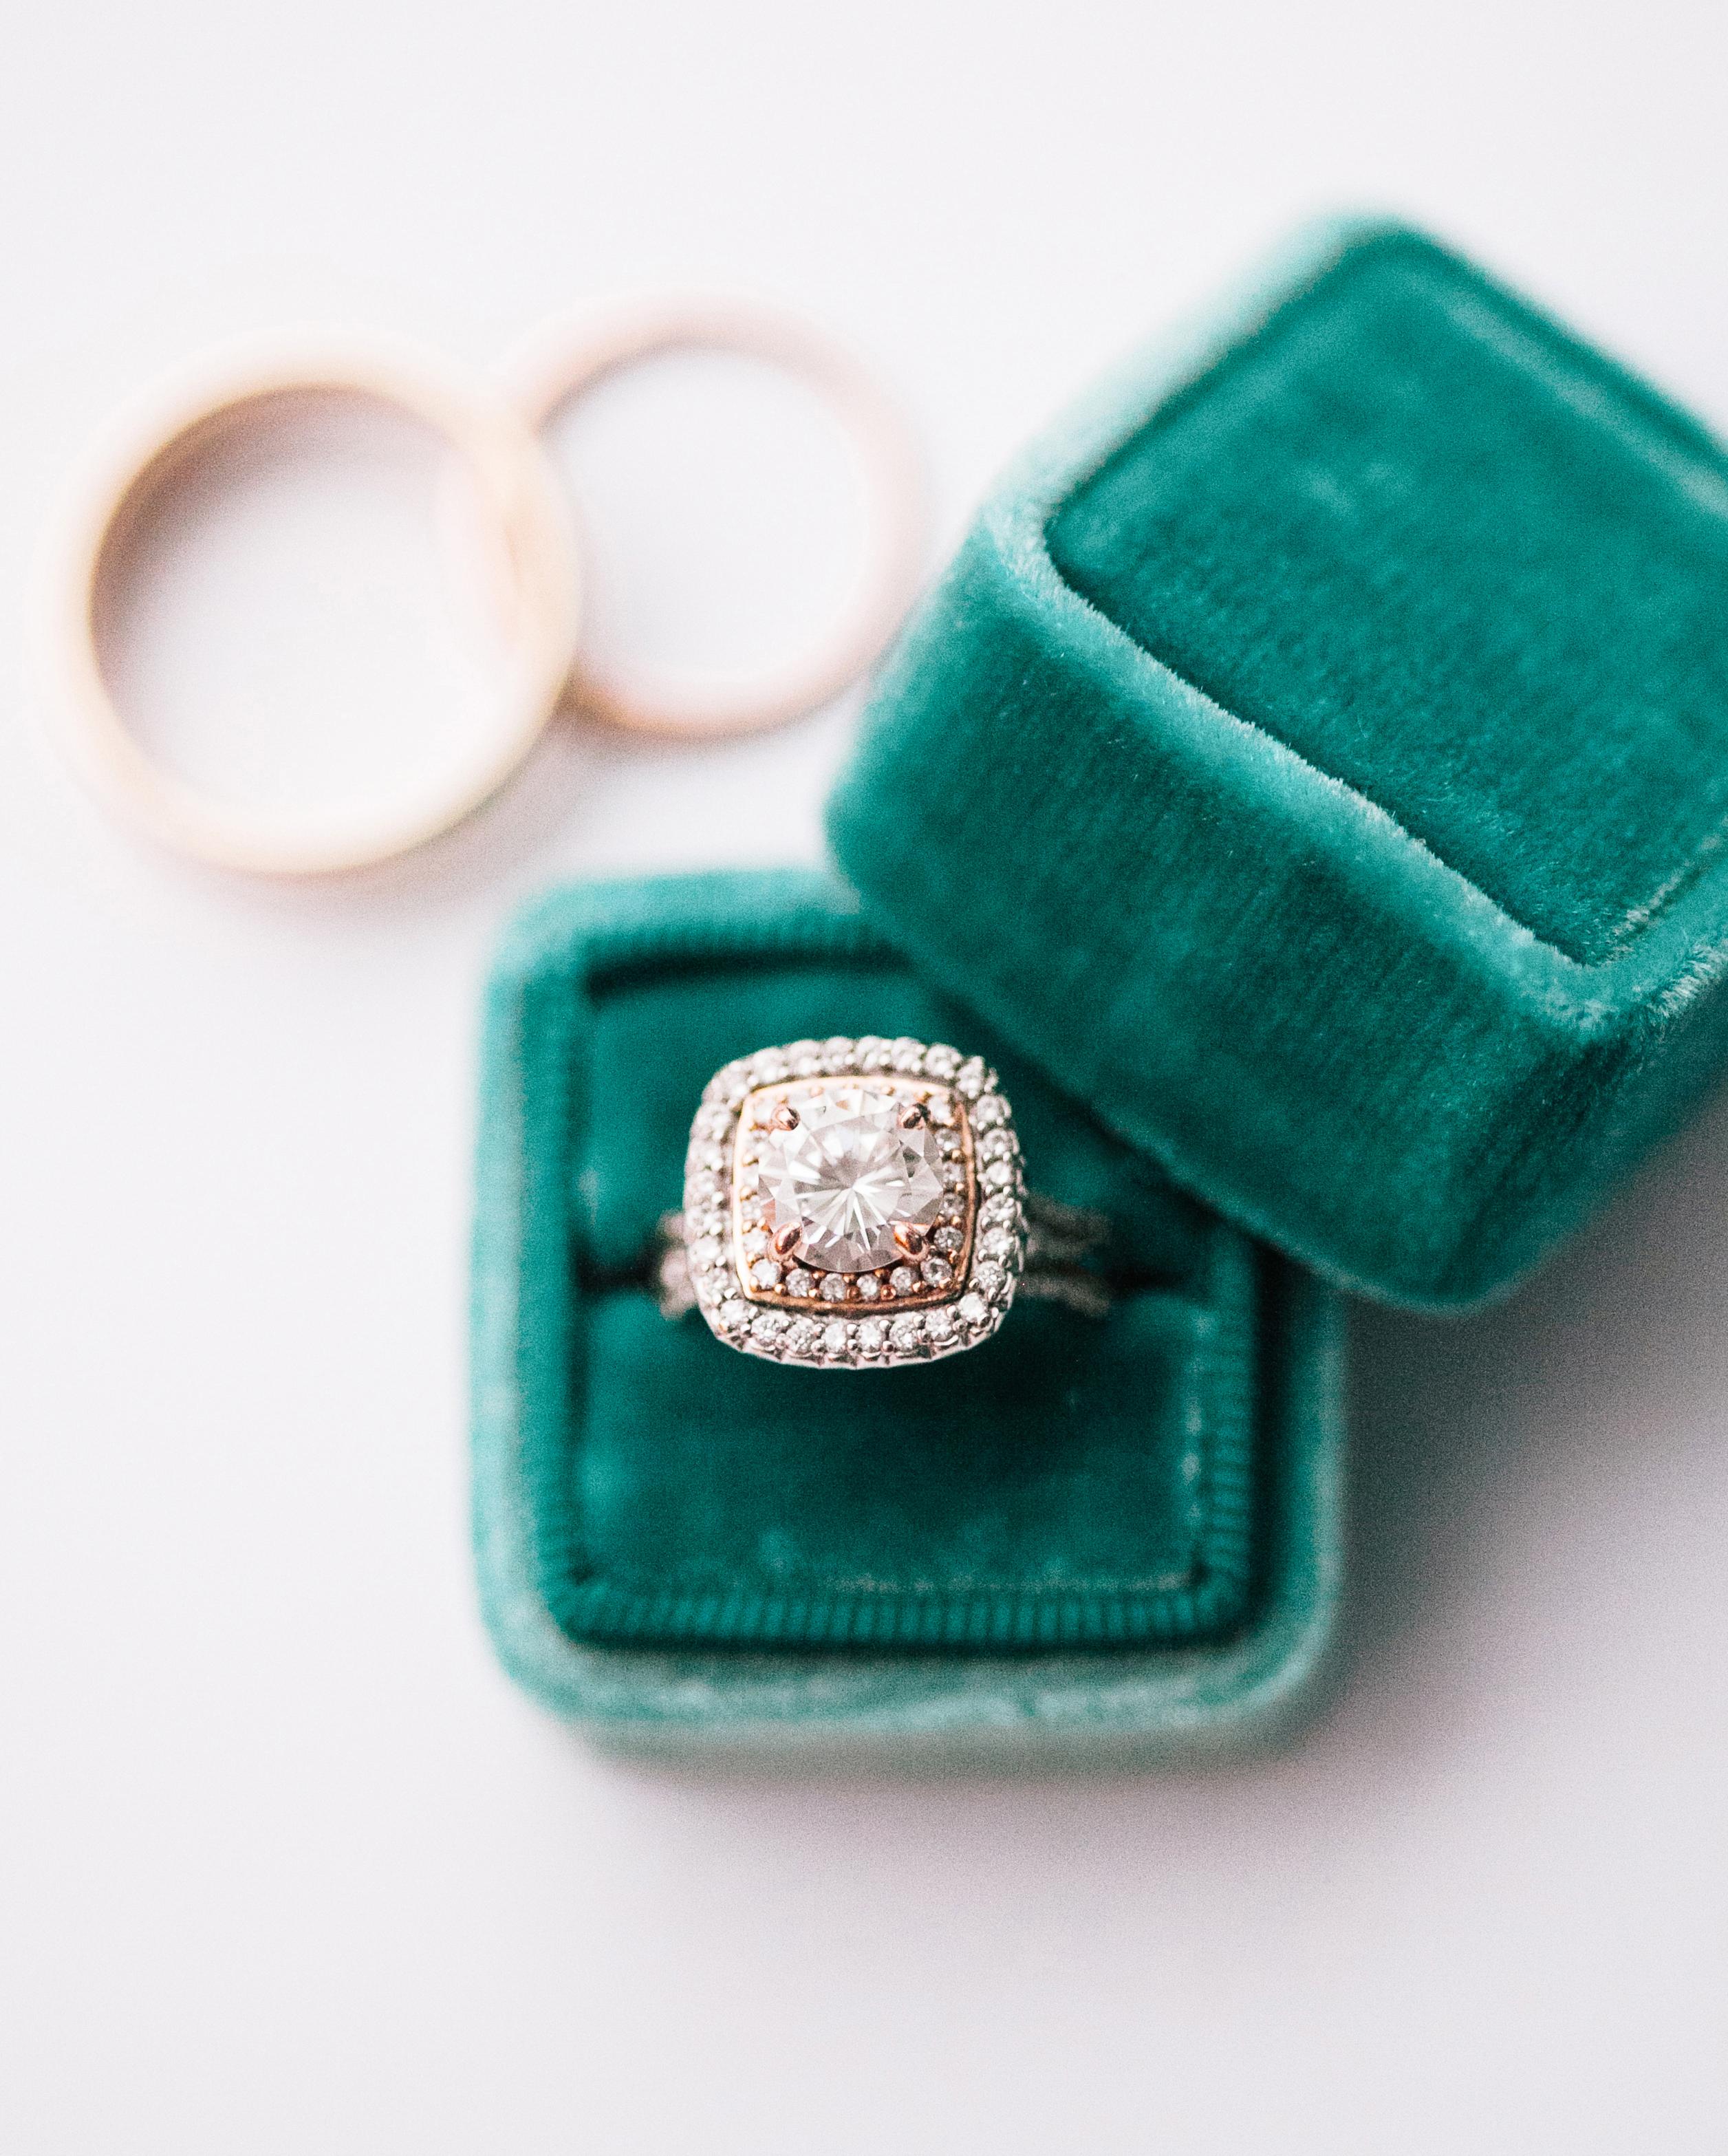 brittany-andrew-wedding-rings-088-s112067-0715.jpg